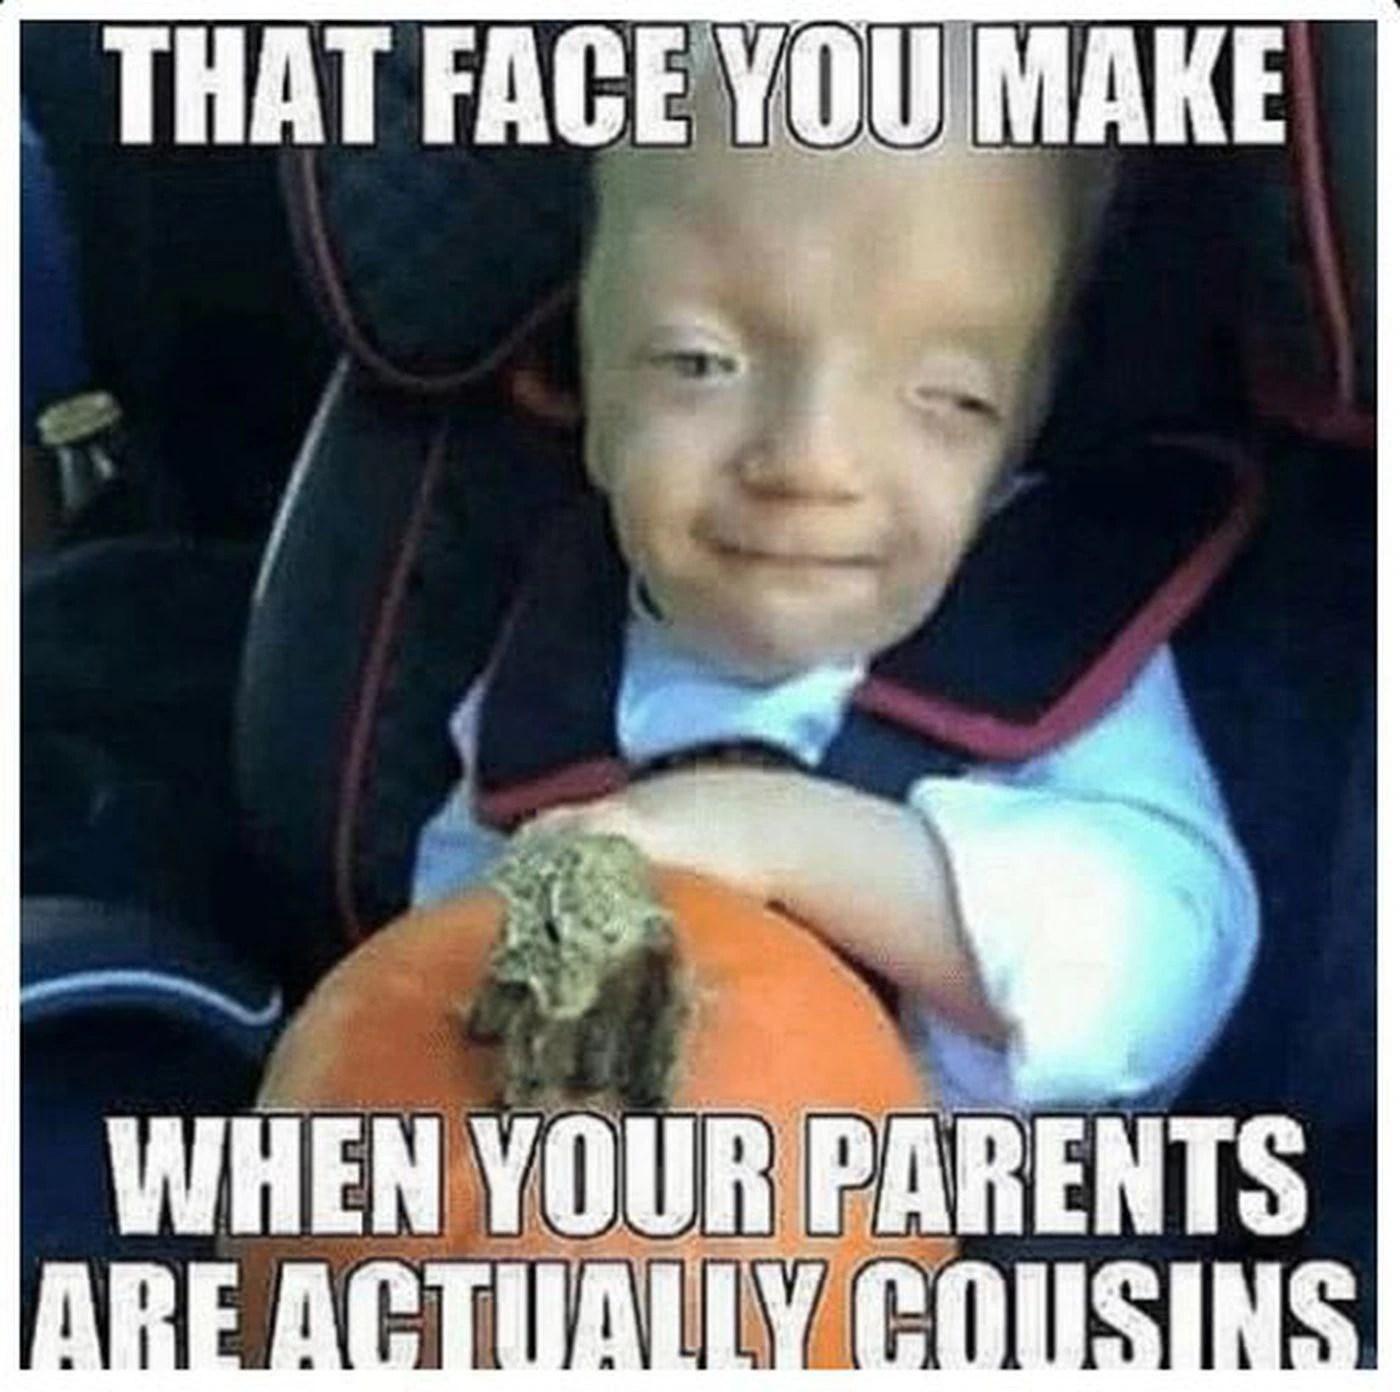 Alabama Toddler Targeted In Cruel Internet Meme